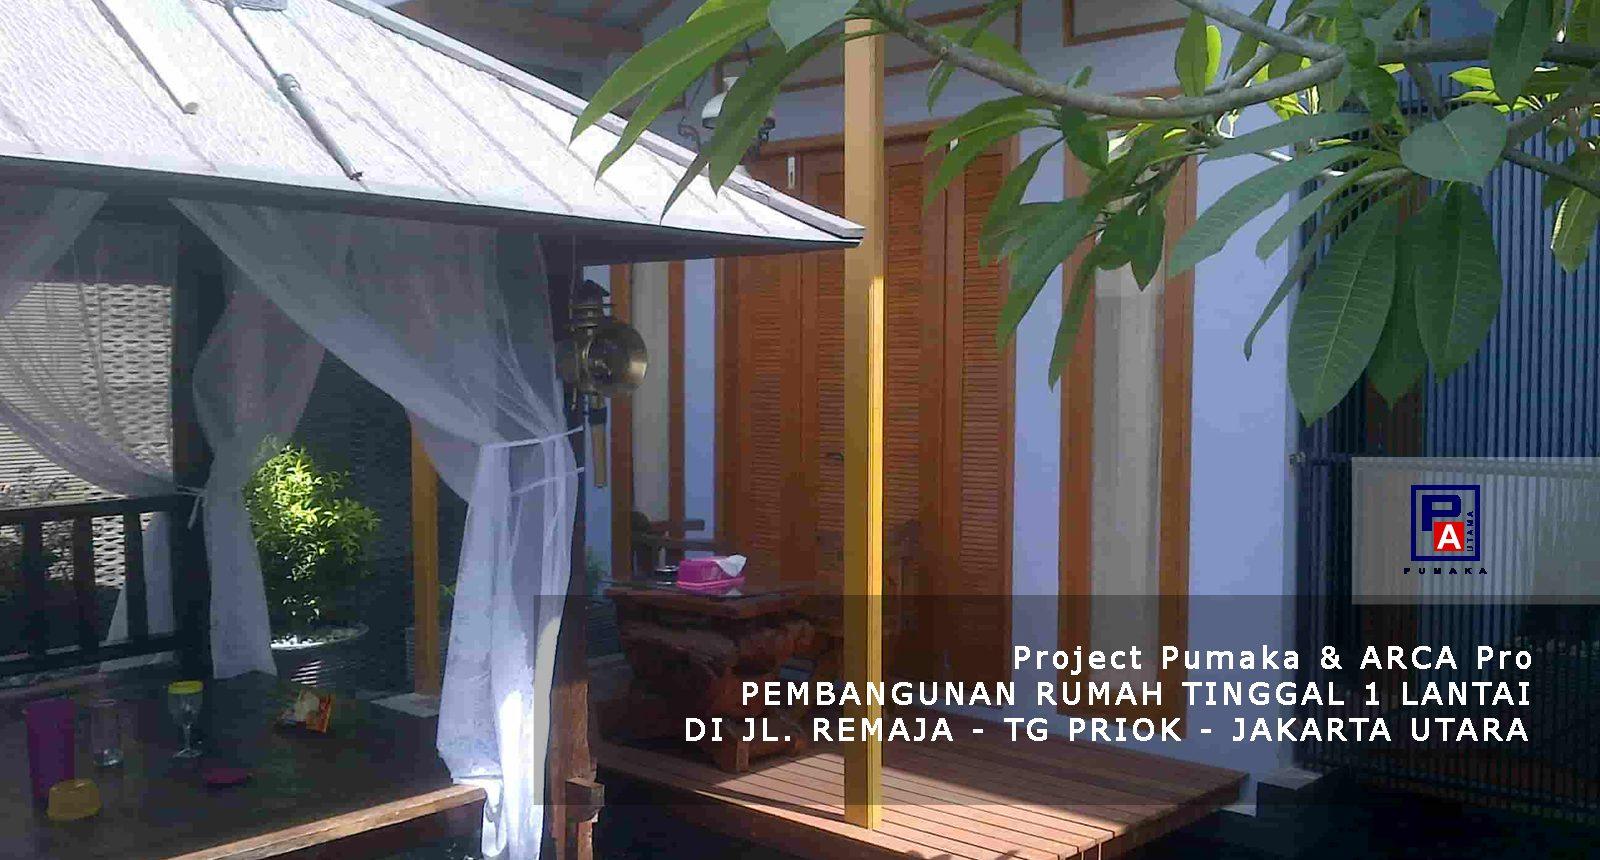 Jasa Arsitek Jakarta Minimalis, Jasa Kontraktor Renovasi Rumah Jakarta